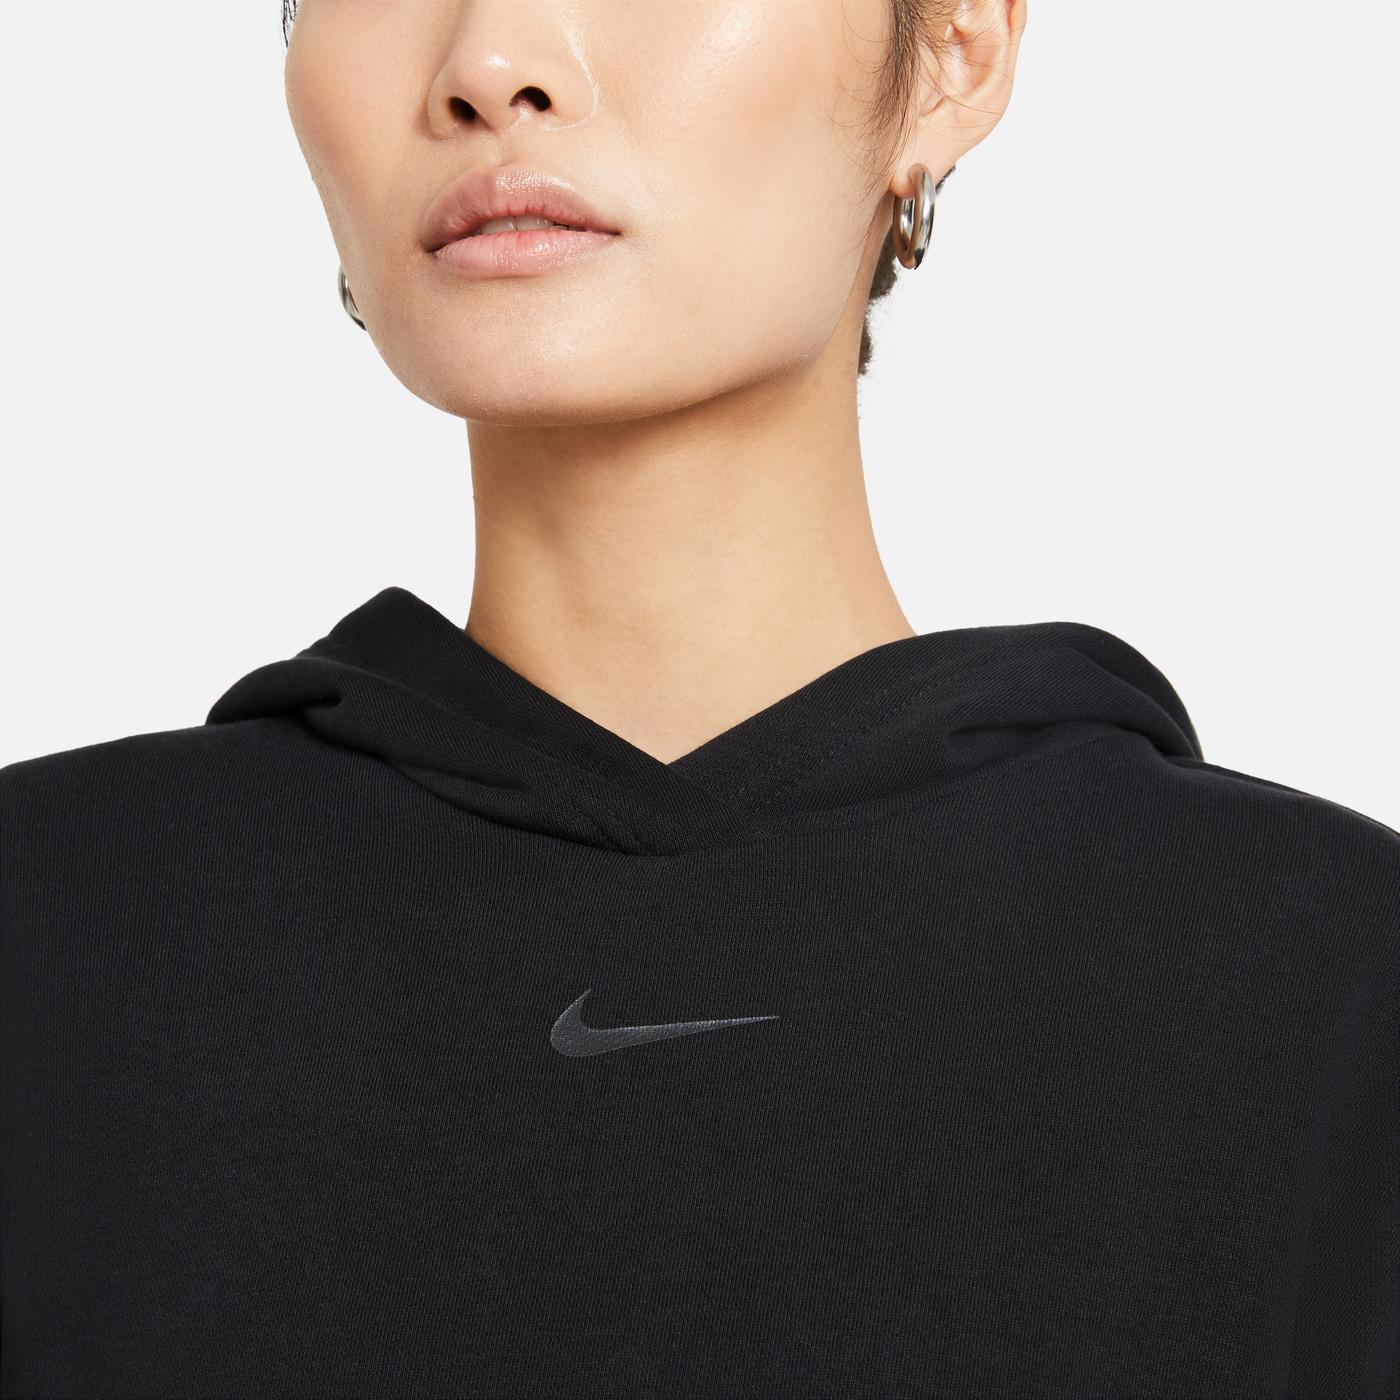 Nike Sportswear Icn Clsh Ft Kadın Siyah Sweatshirt